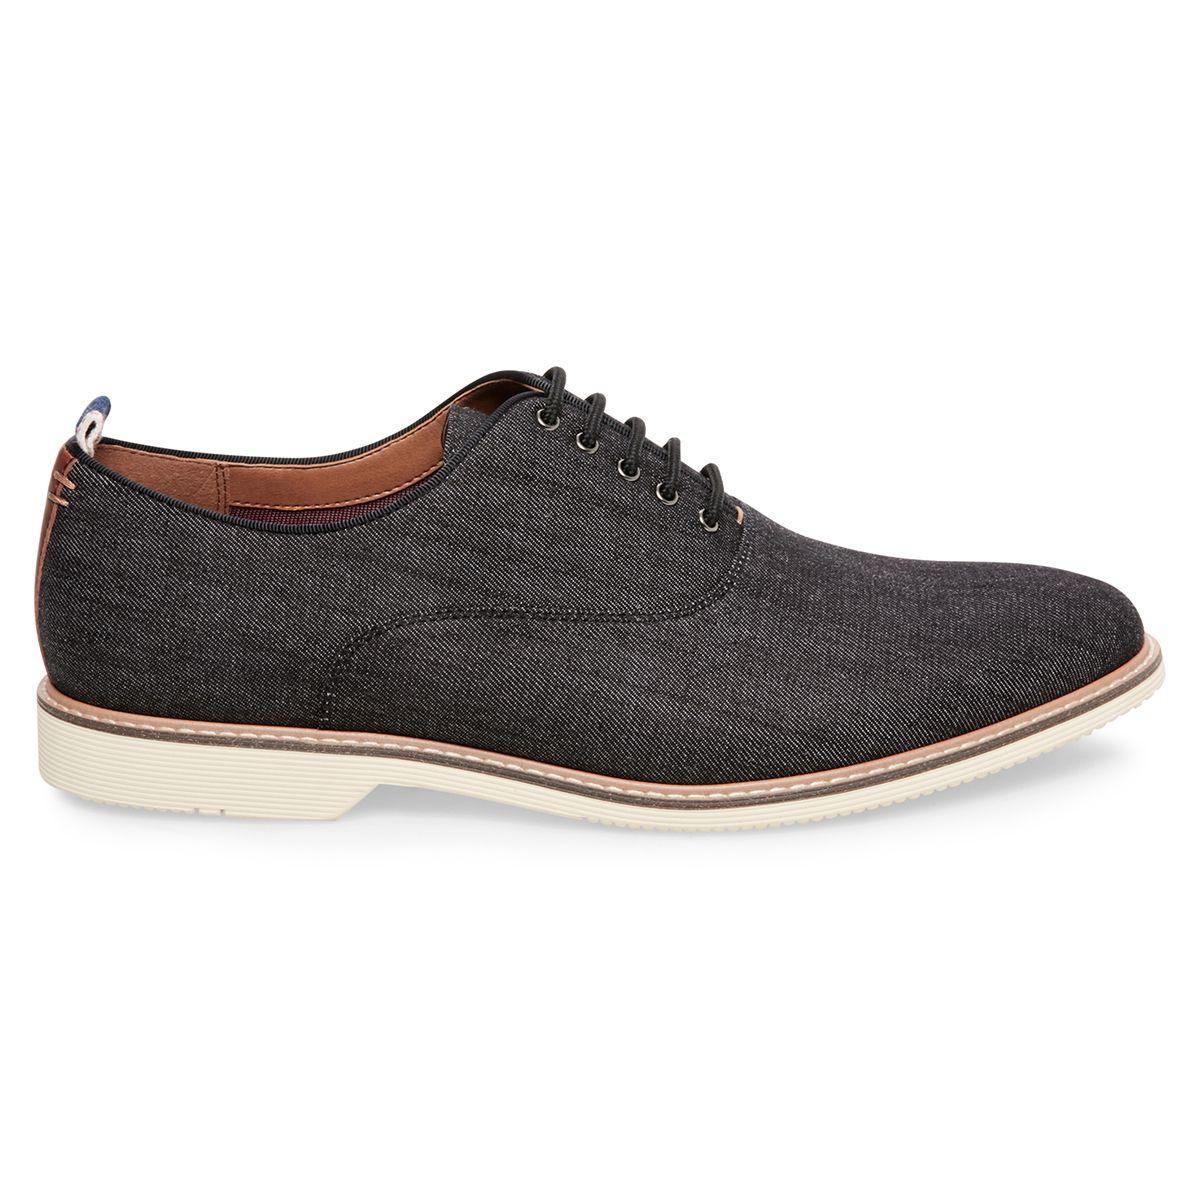 26e7cf1b0372 Steve Madden Shoes